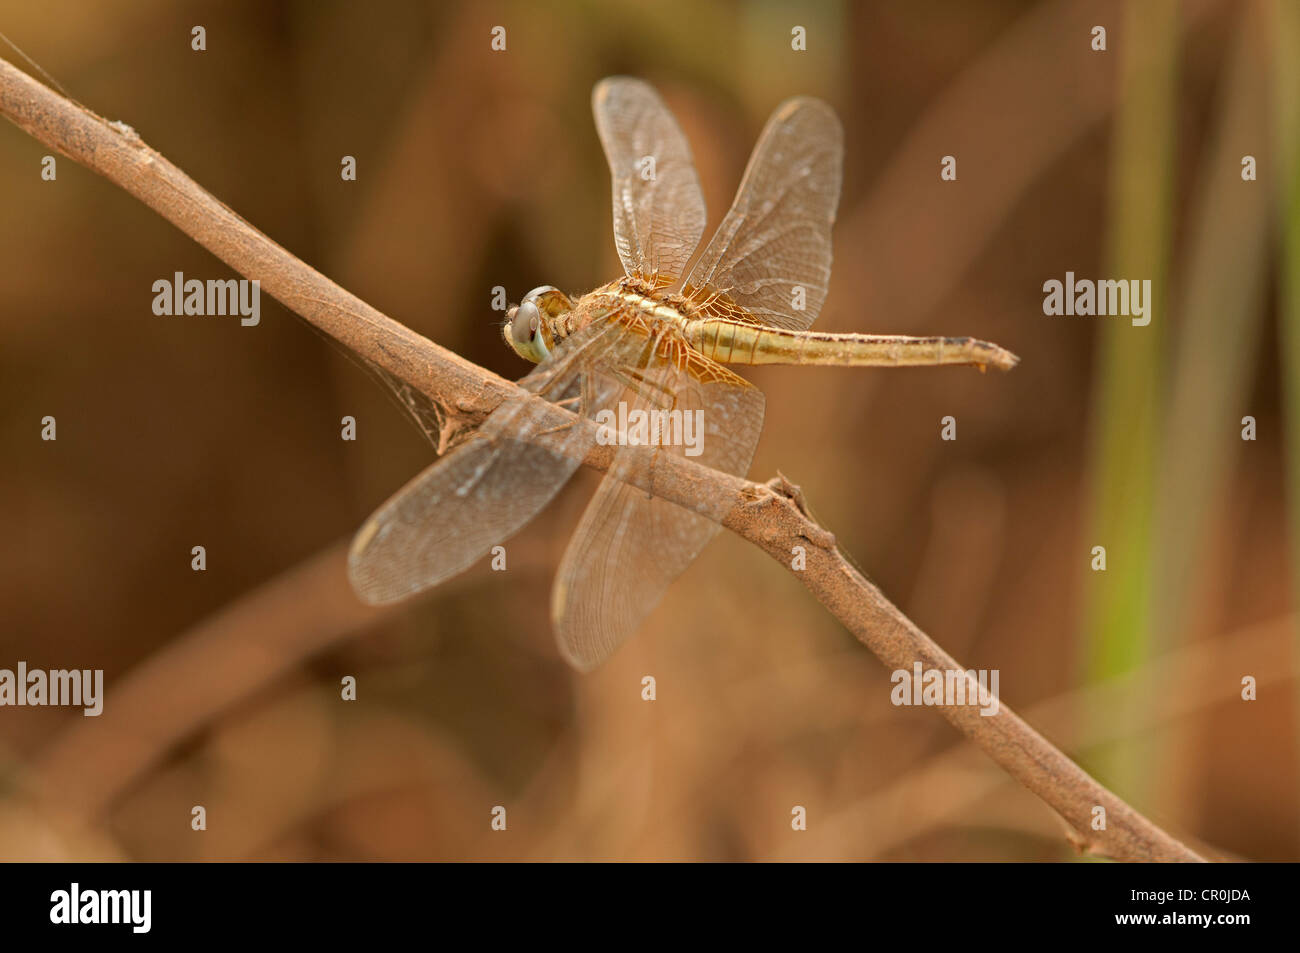 Scarlet skimmer, crimson darter (Crocothemis servilia), female, Battambang, Cambodia, Southeast Asia, Asia - Stock Image